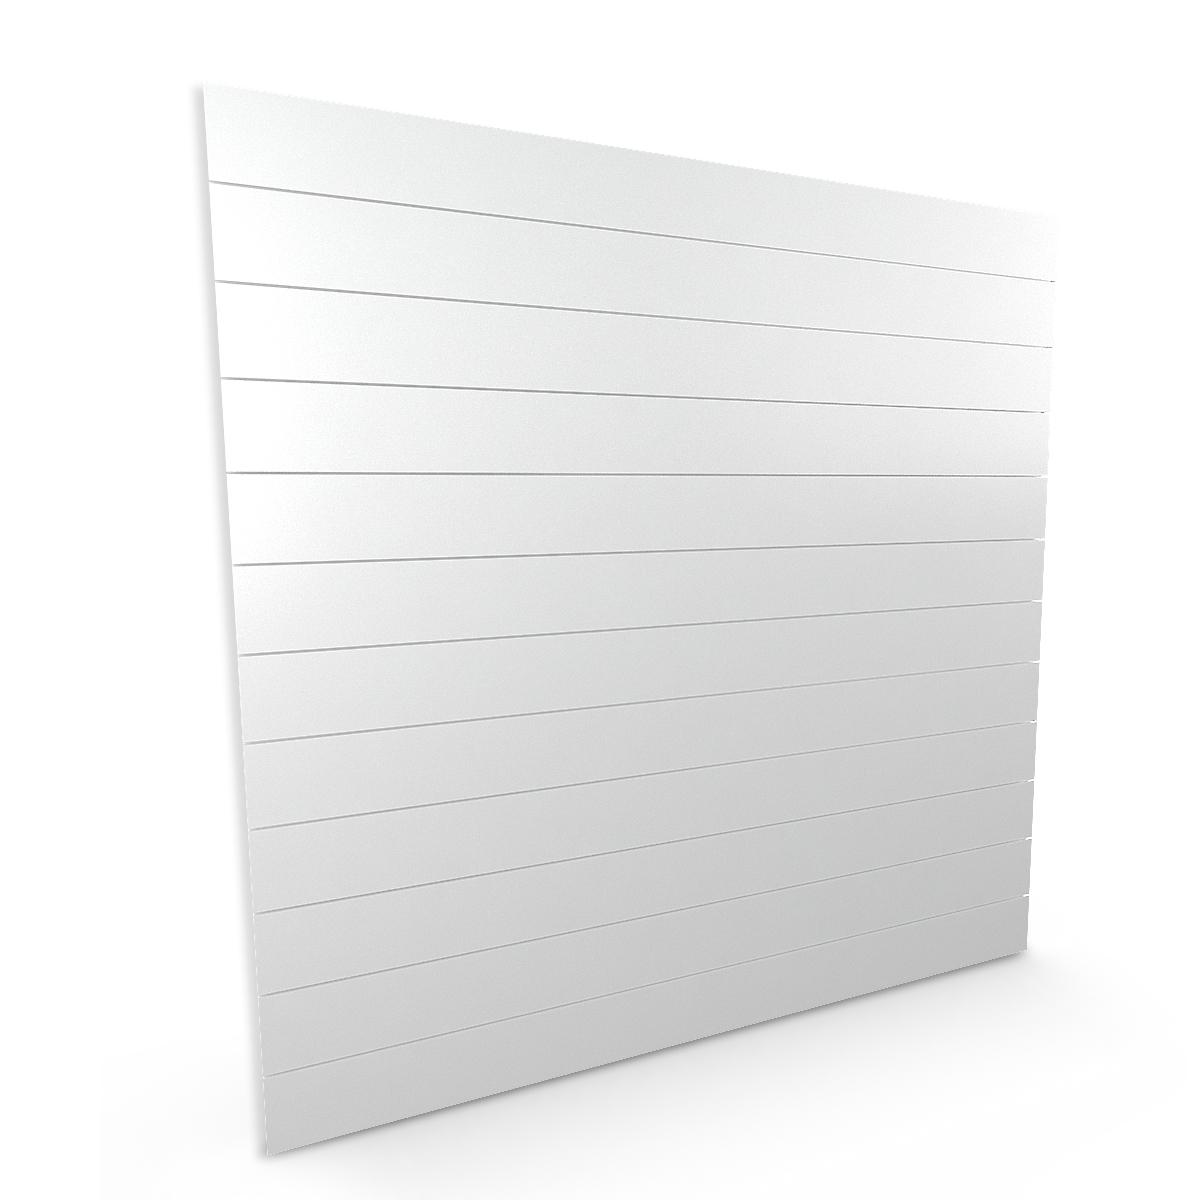 Spacewall Lamellenwand Slatwall weiß